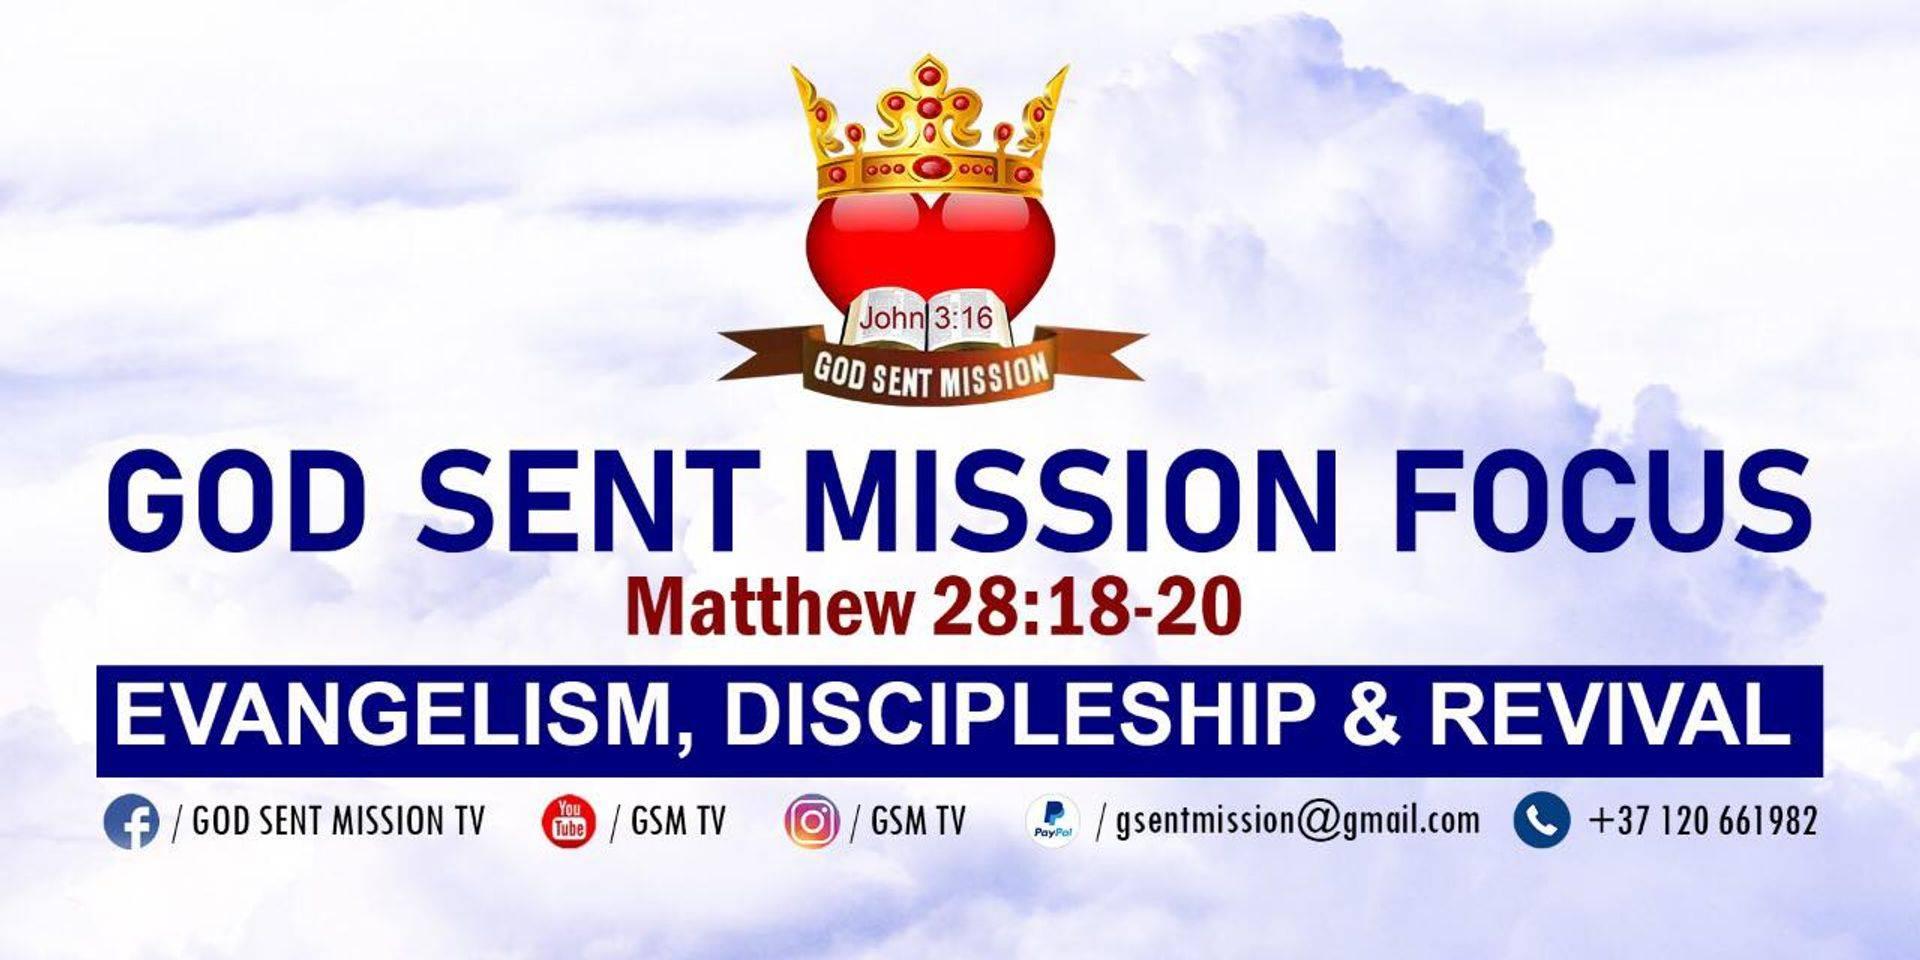 Online discipleship training